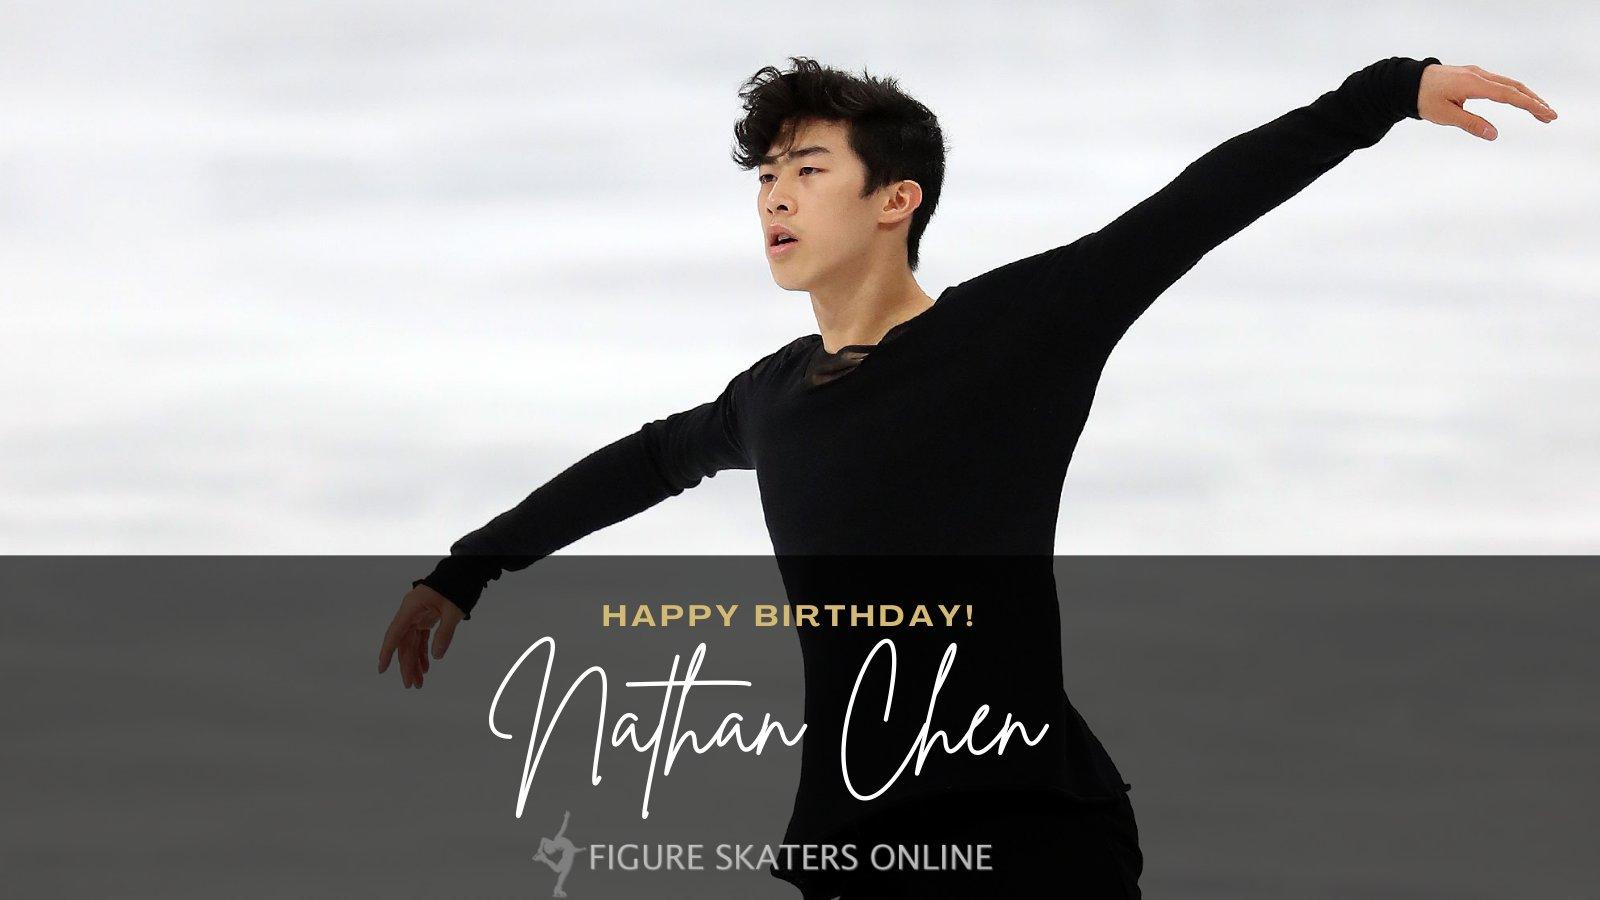 Нэтан Чен / Nathan CHEN USA - Страница 11 E0n8gN4XEAIJeXr?format=jpg&name=large